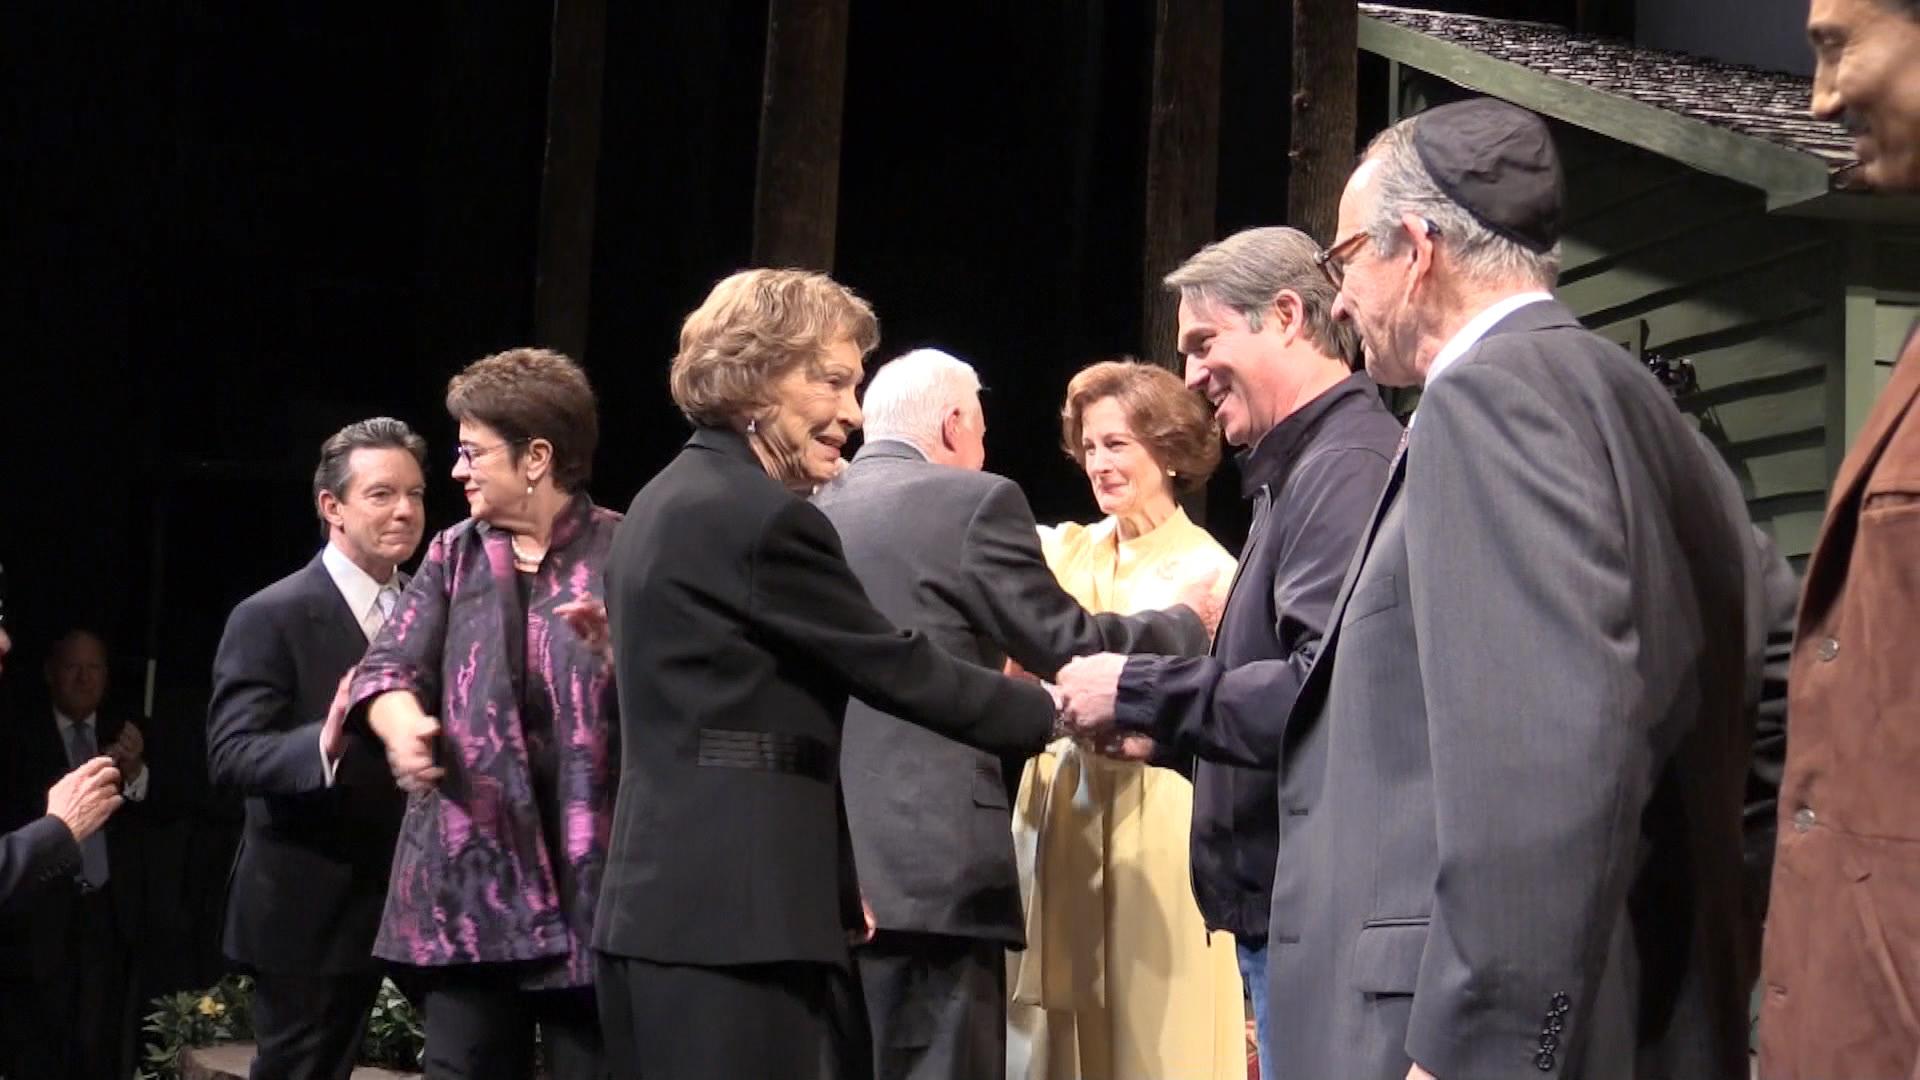 Camp David peace talks hit the stage